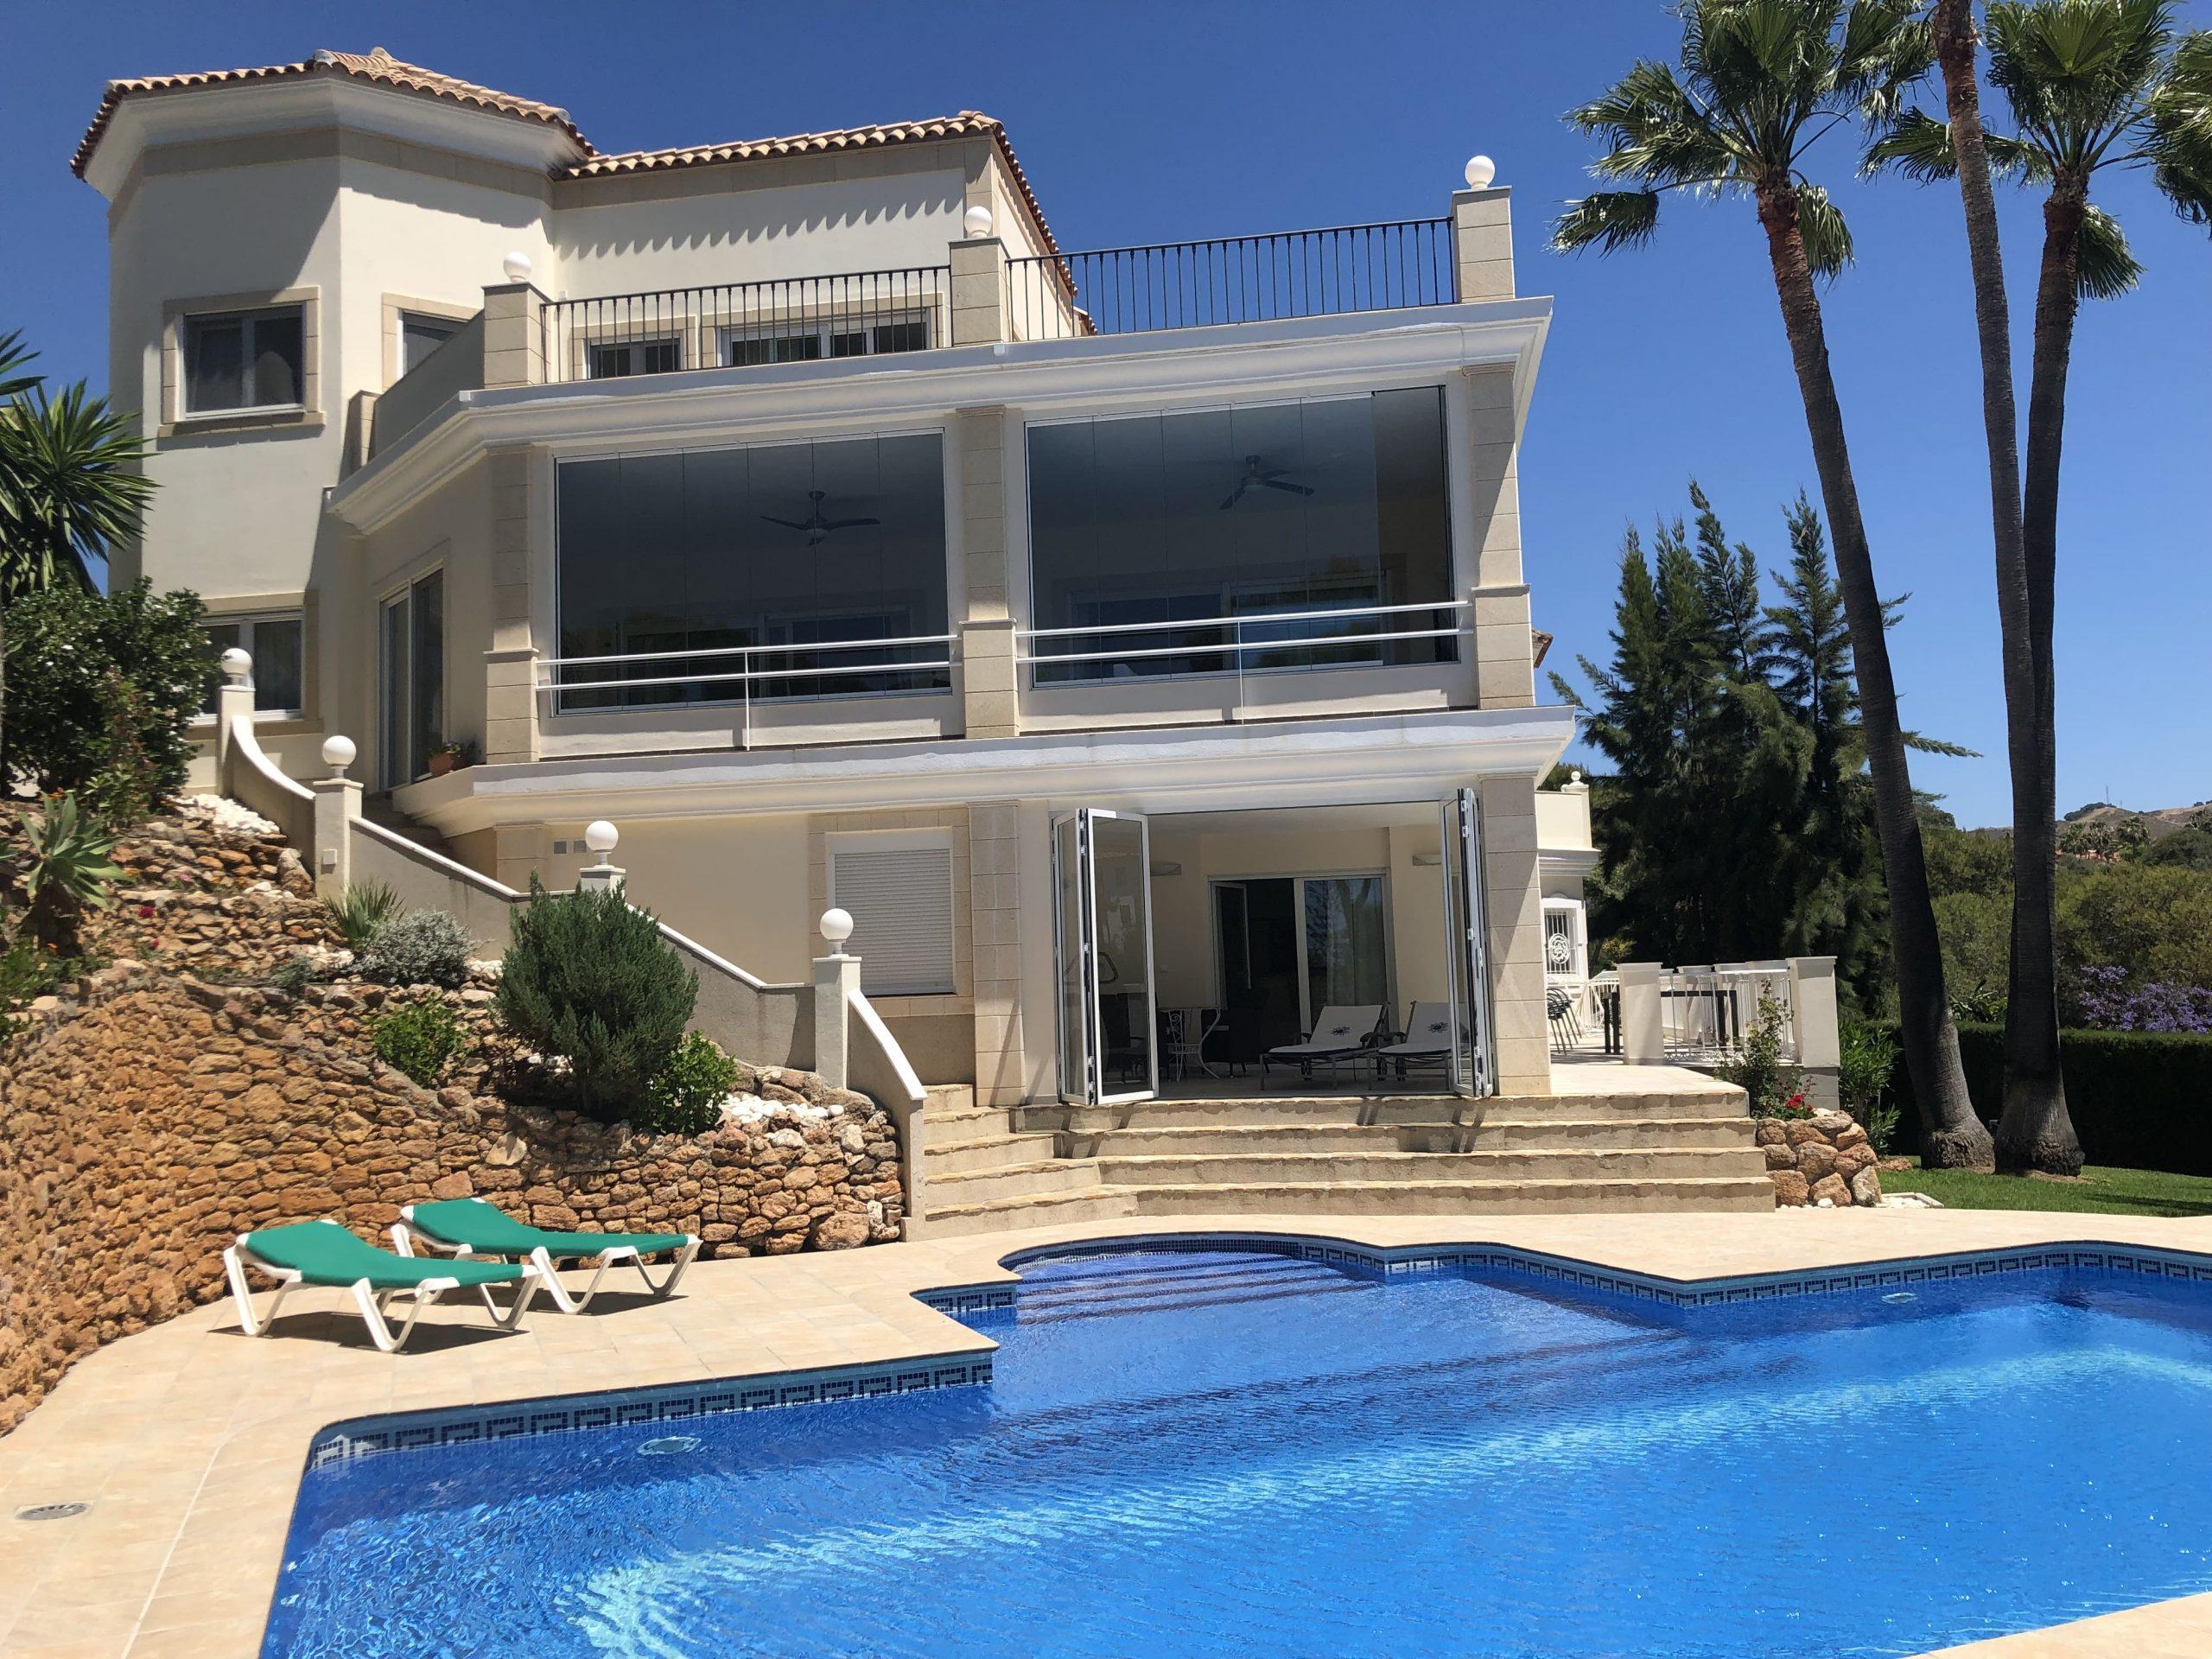 Espectacular casa vacacional en Marbella